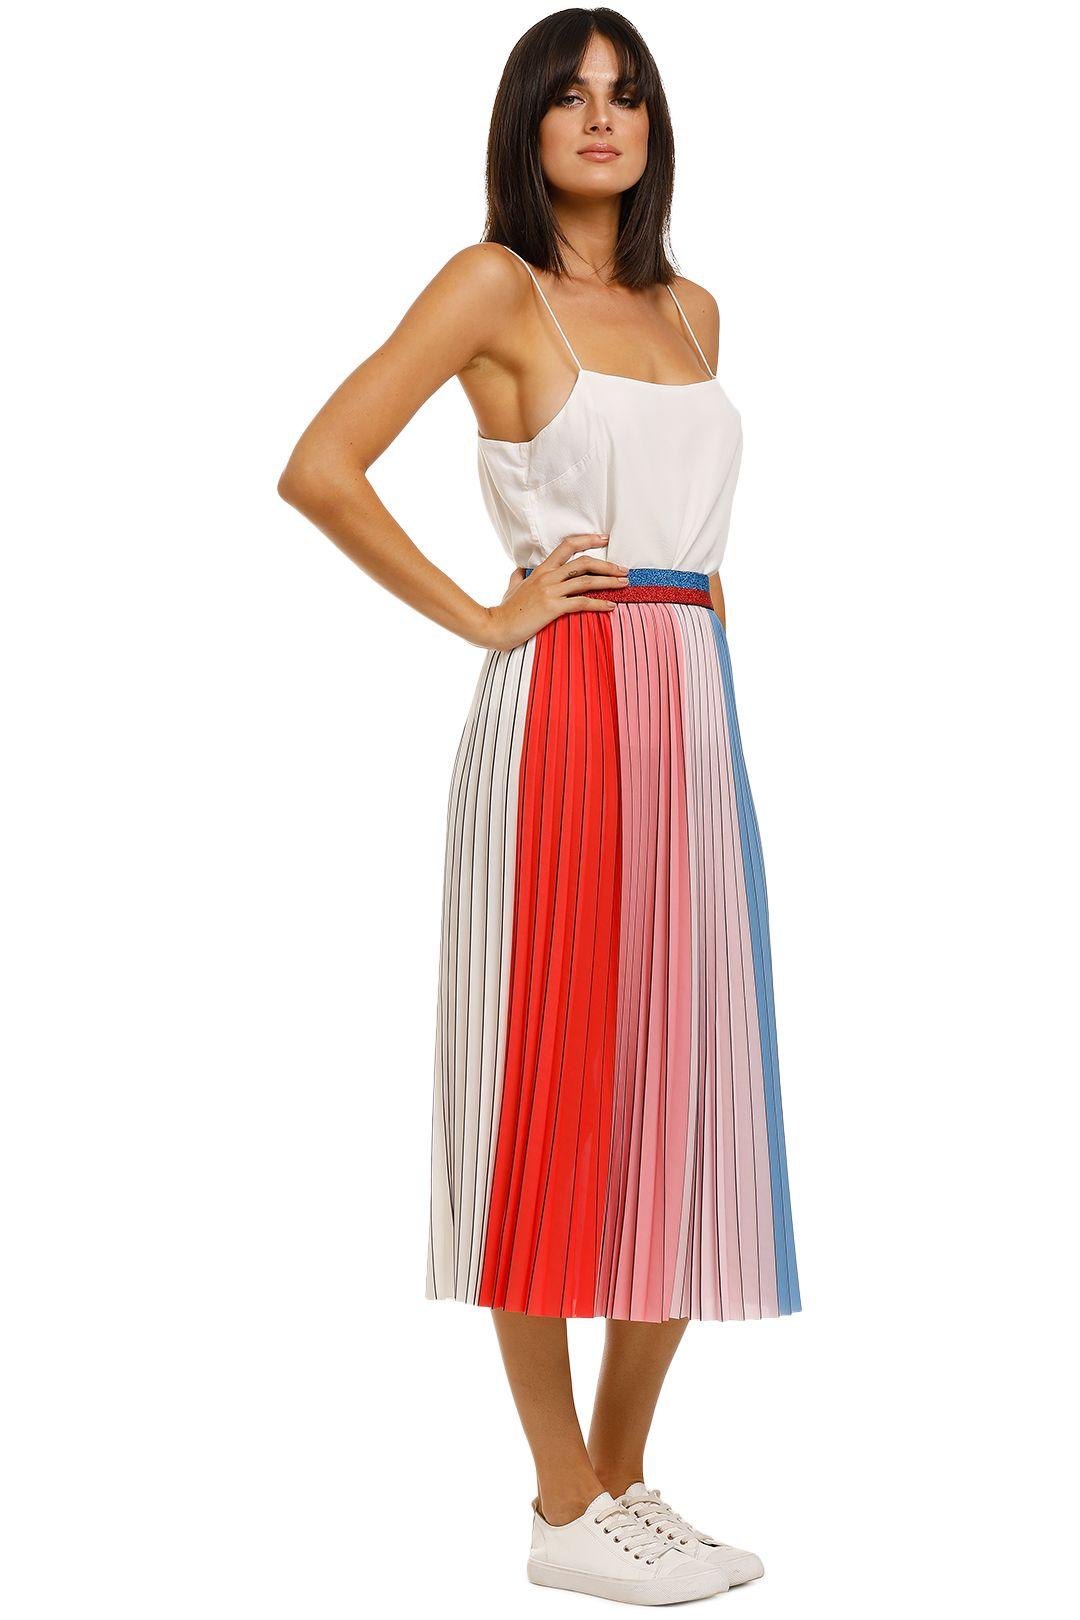 Coop-by-Trelise-Cooper-Let-Them-Pleat-Cake-Skirt-Sherbet-Side